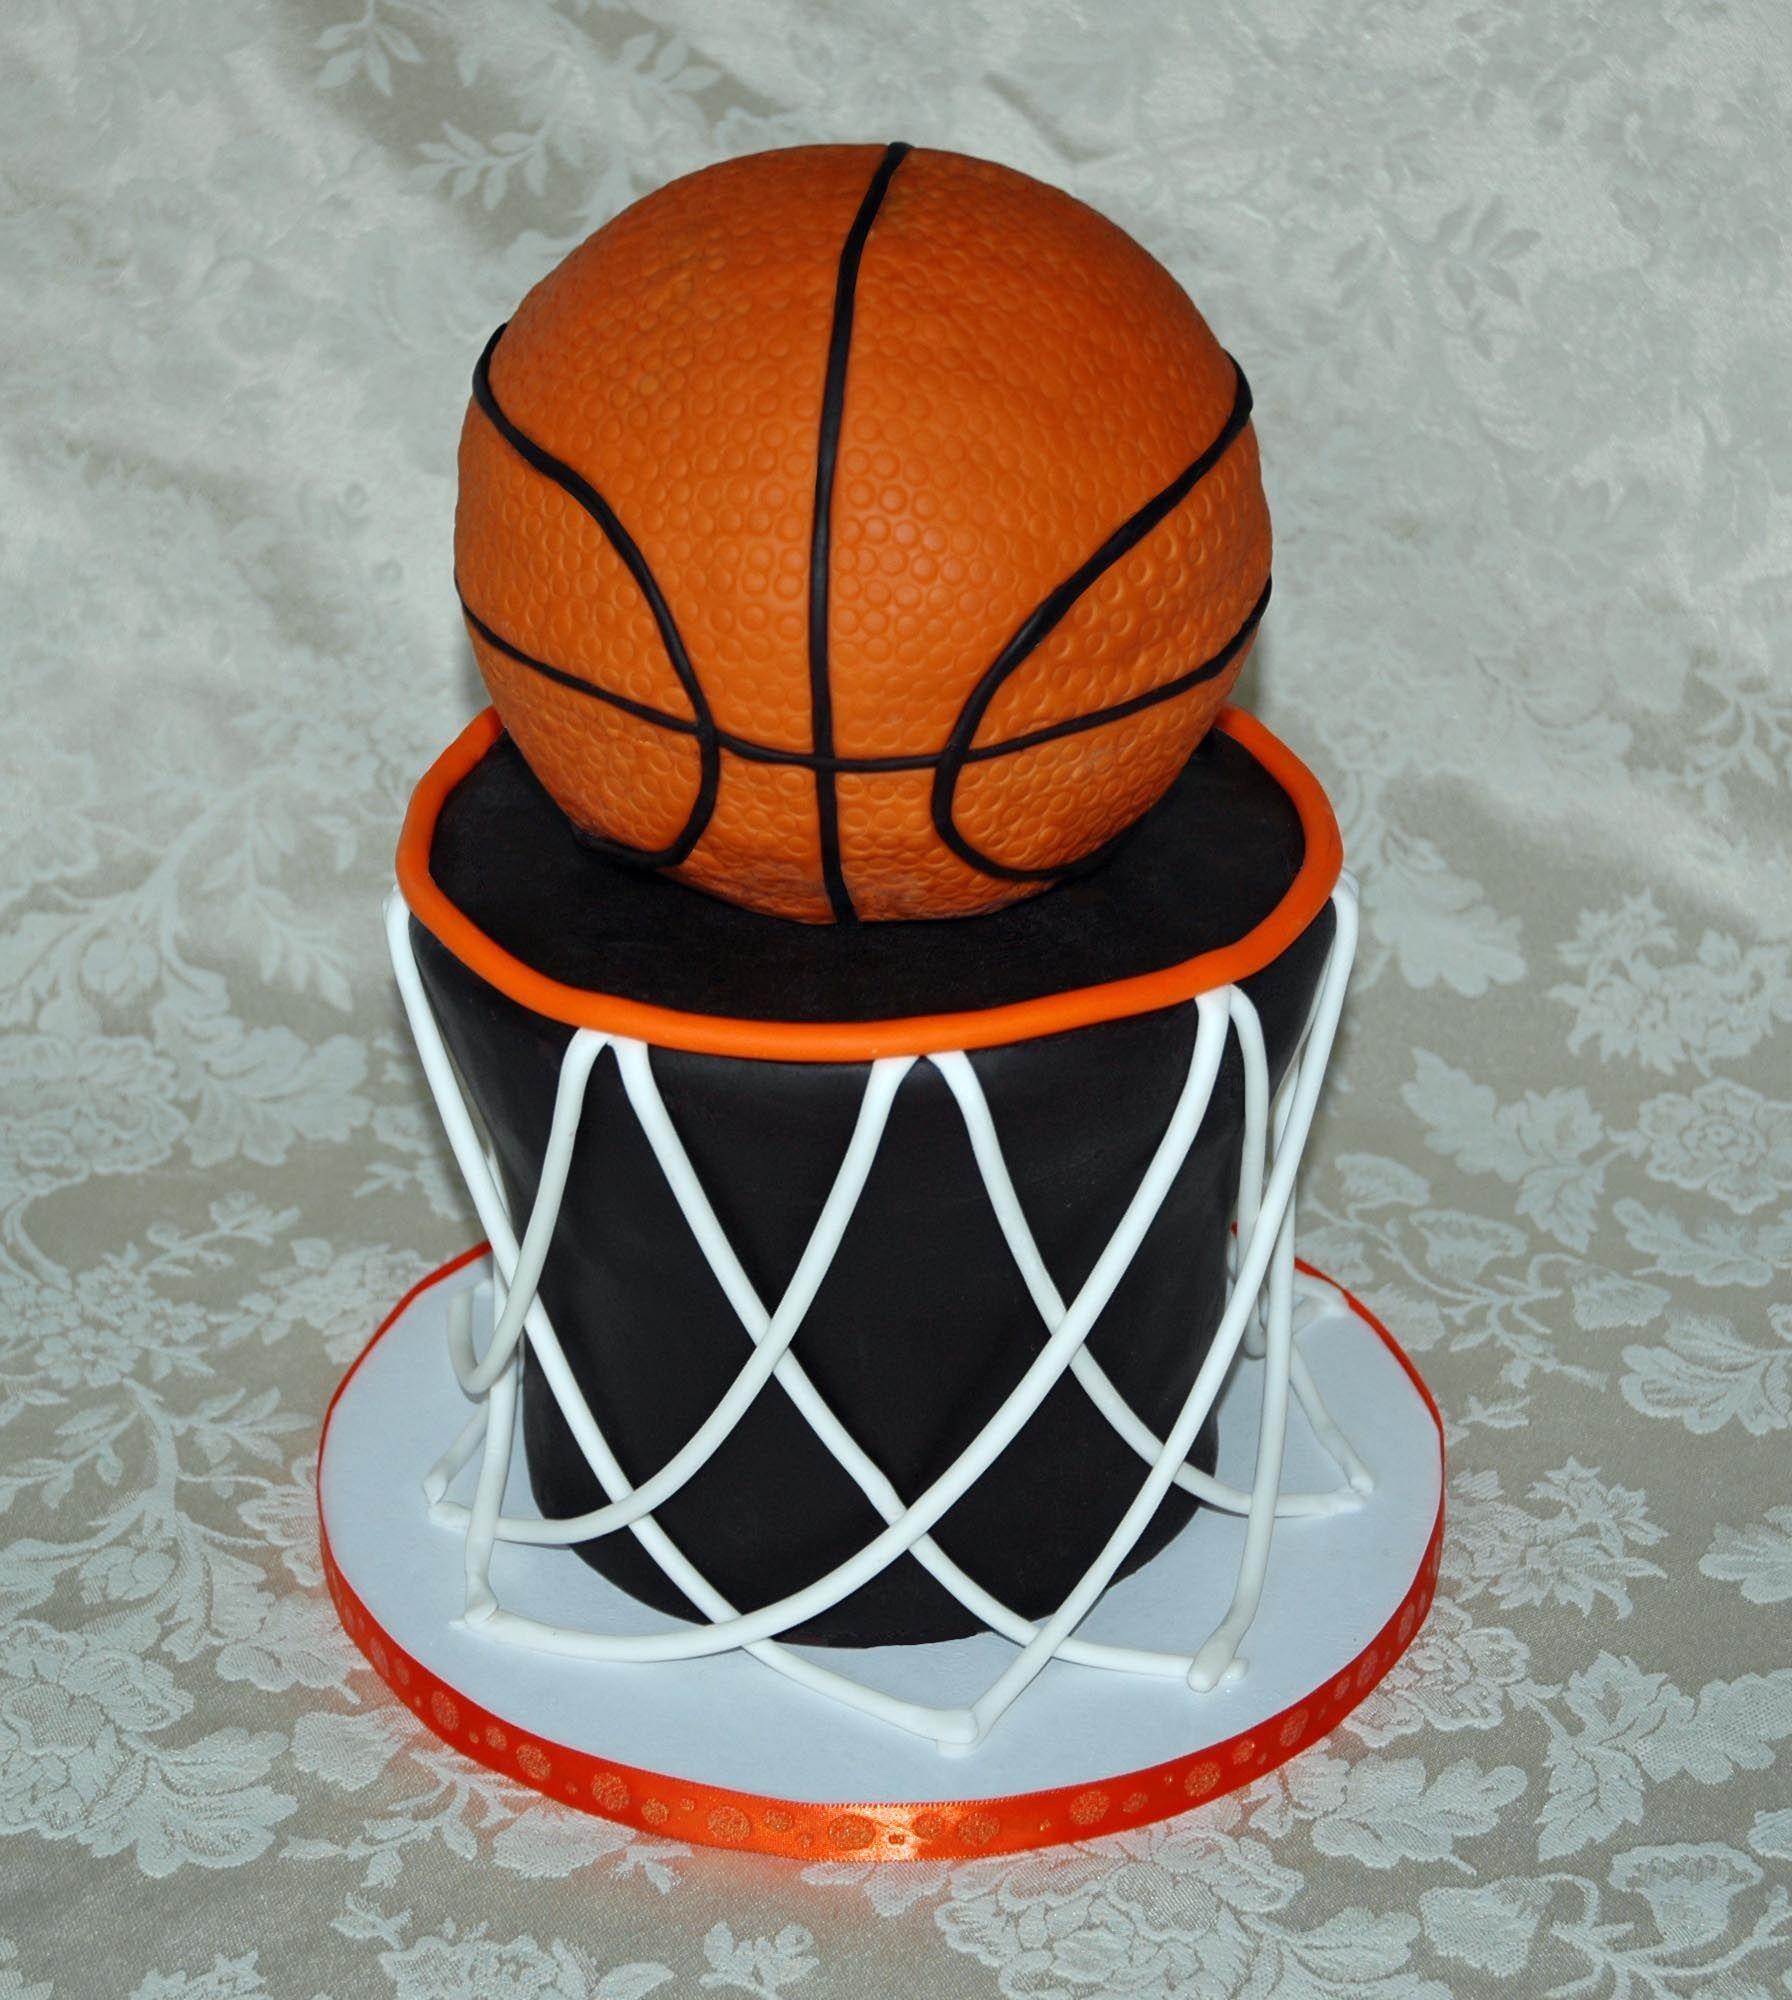 Basketball Cake 1gateau